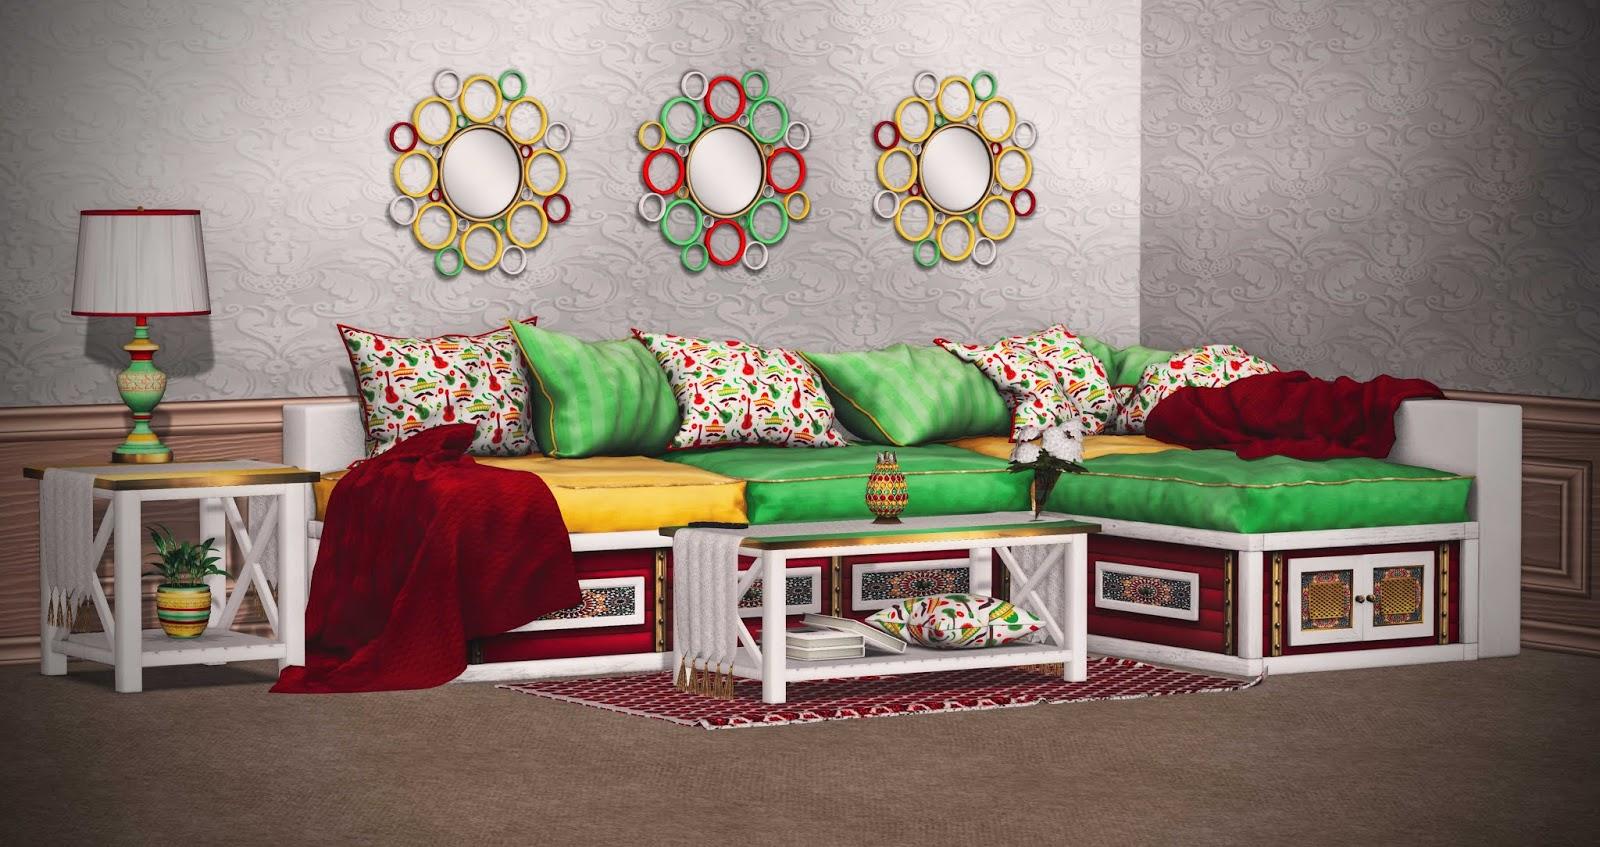 The Fiesta Pedestal Living Room Set